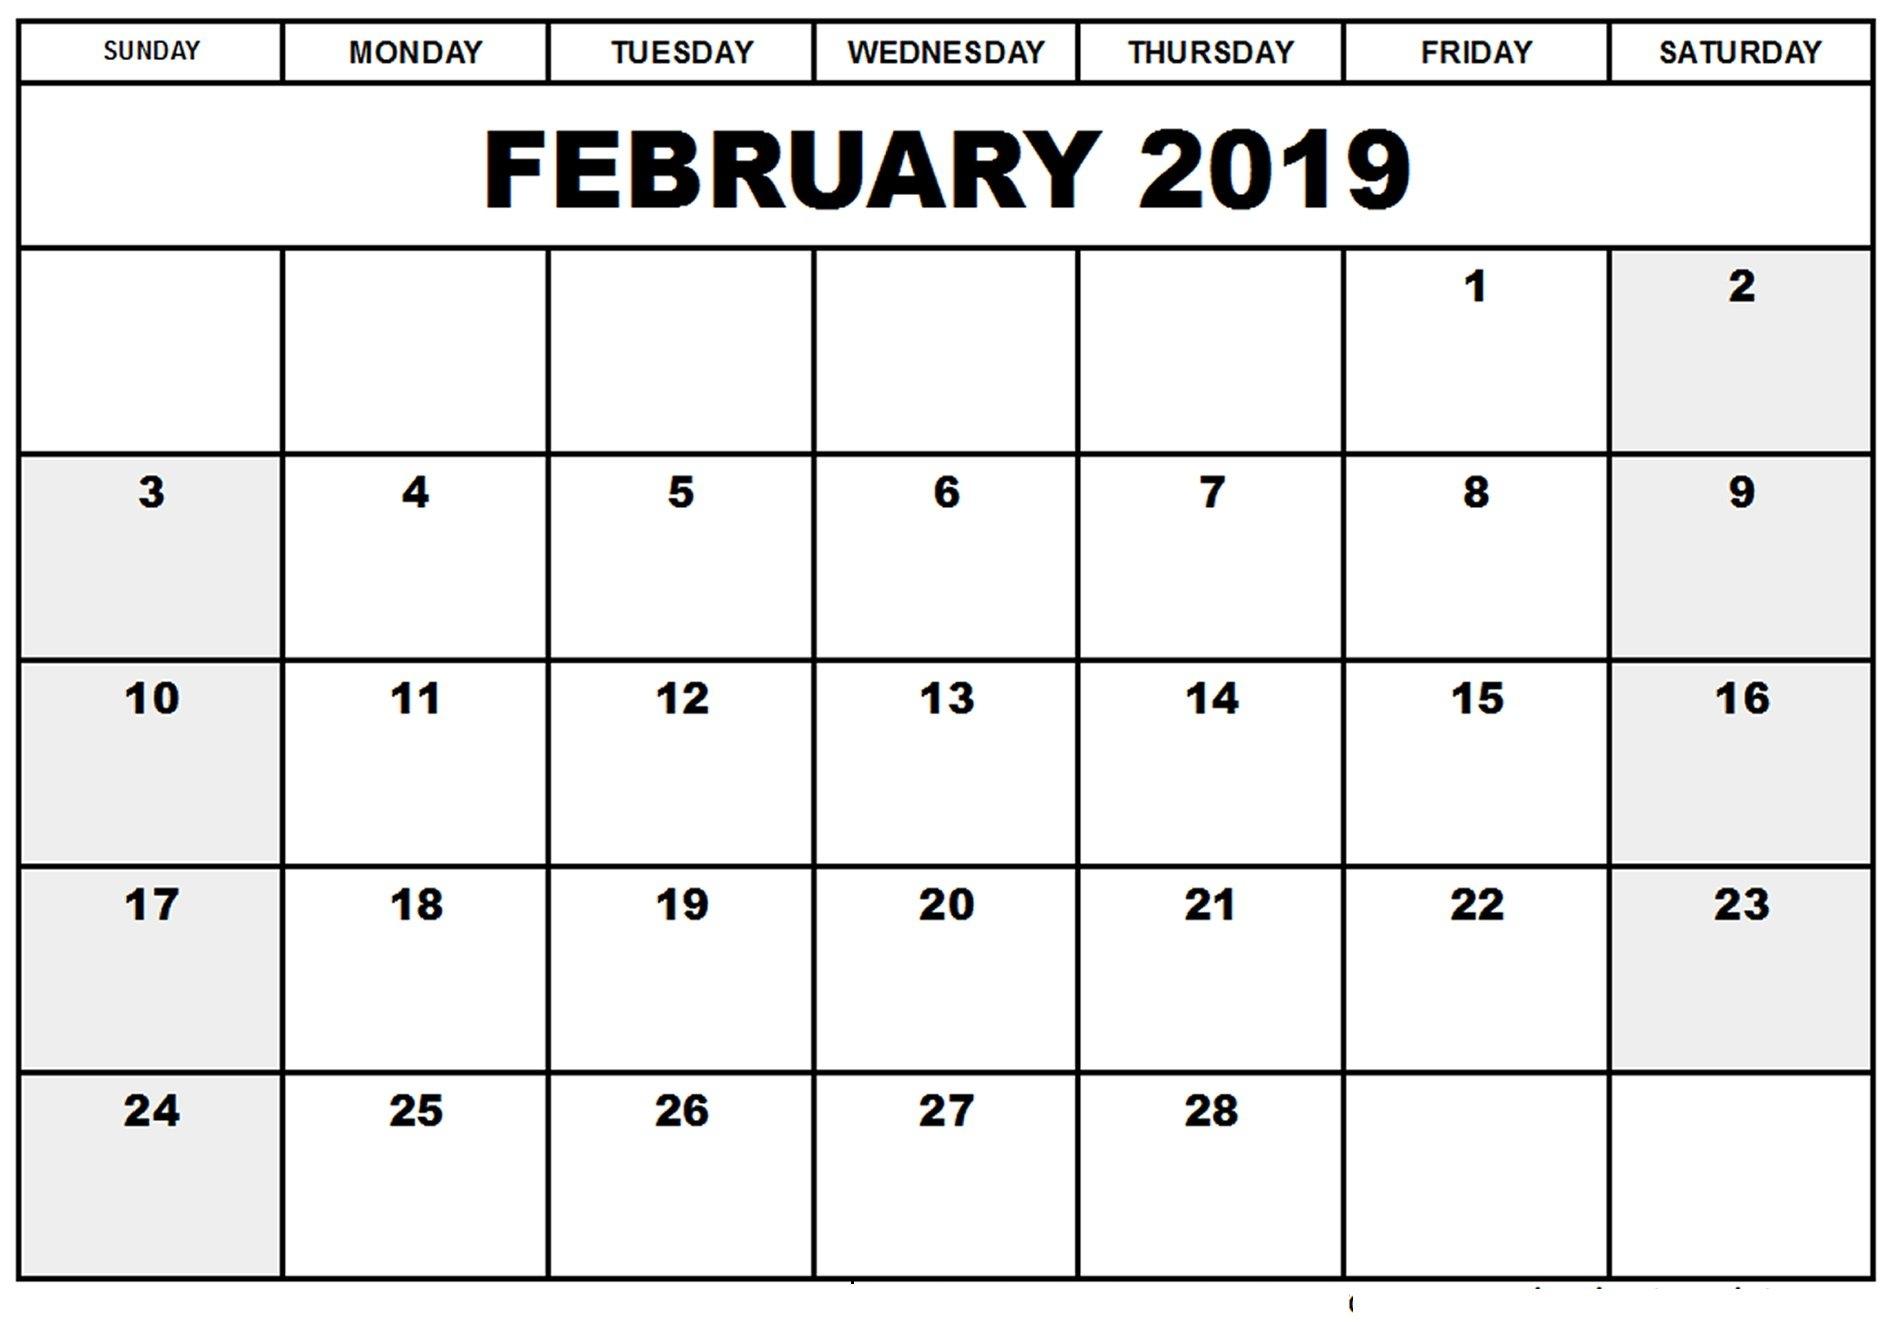 Online February 2019 Calendar Editable | Free Online Calendars Calendar 2019 Buy Online